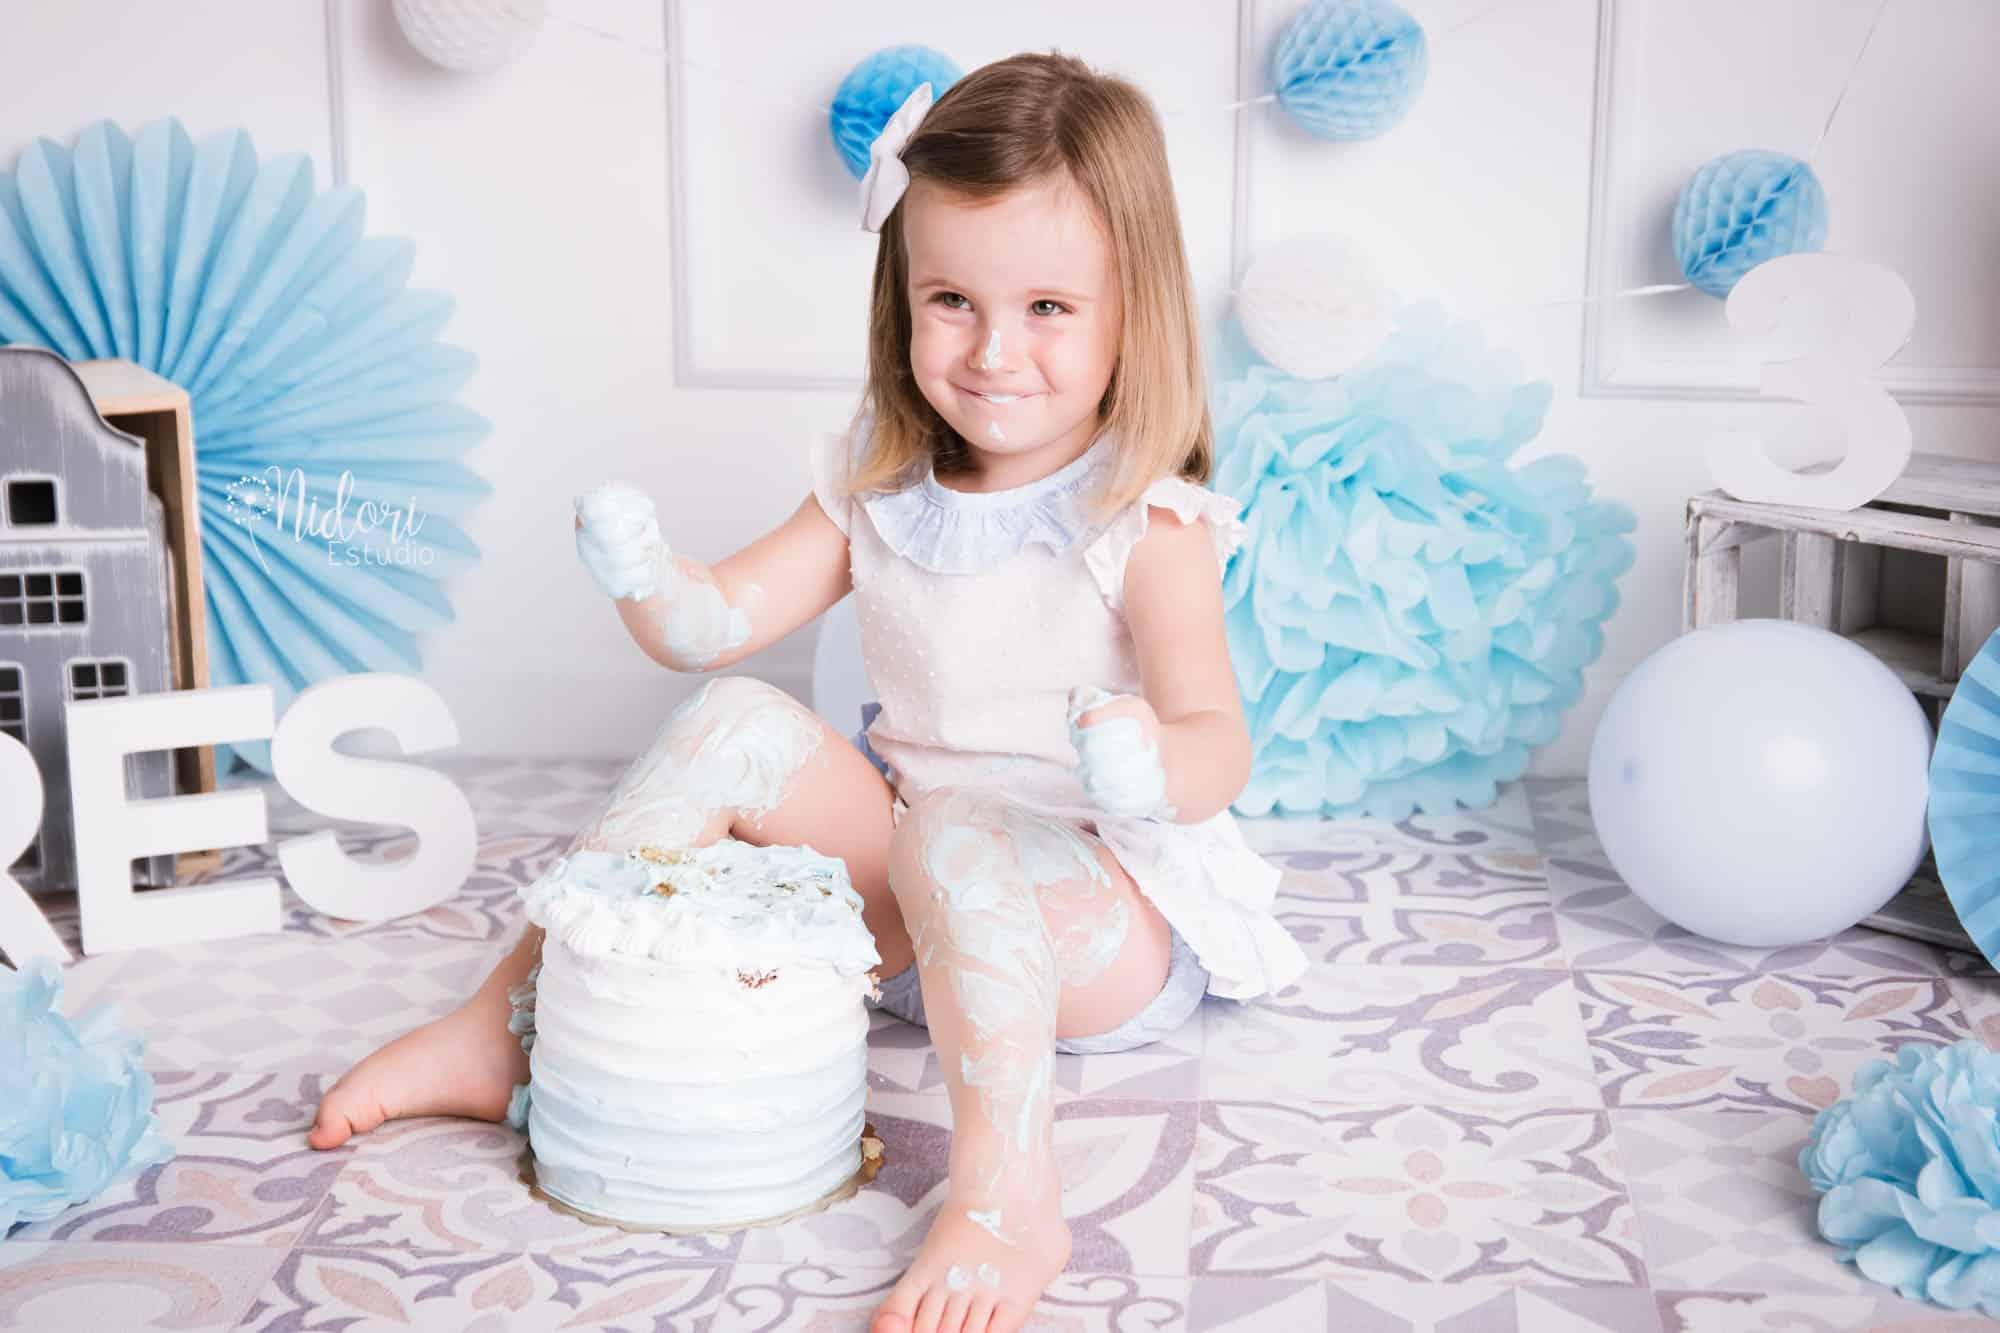 smash-cake-cumpleaños-tarta-fotografia-niños-bebes-nidoriestudio-fotos-valencia-almazora-castellon-españa-spain-16